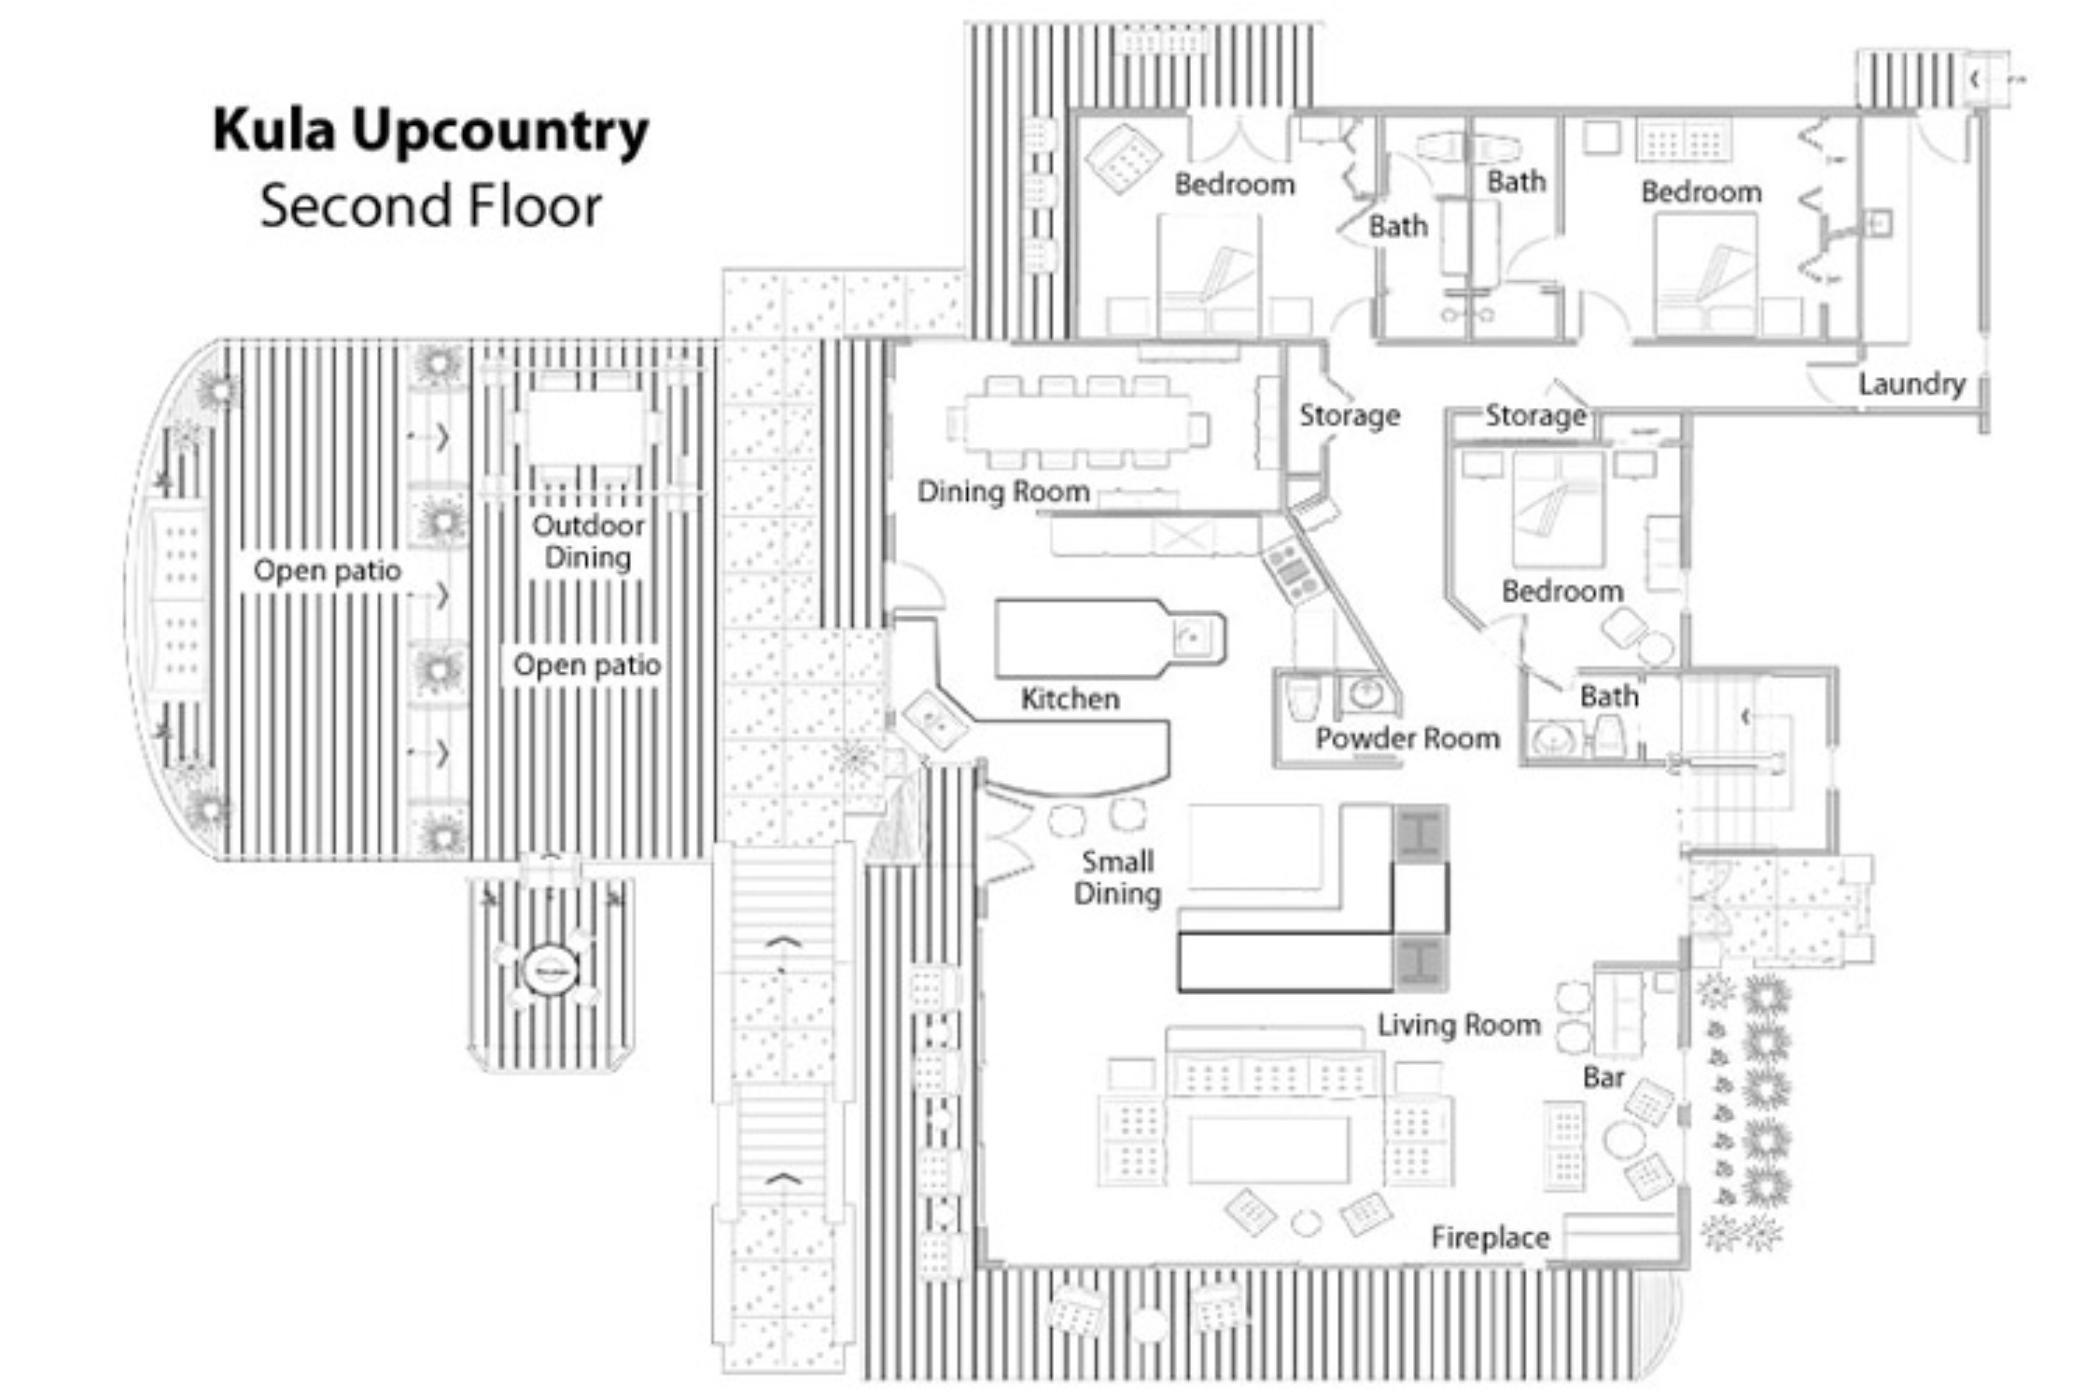 kula upcountry estate villaway